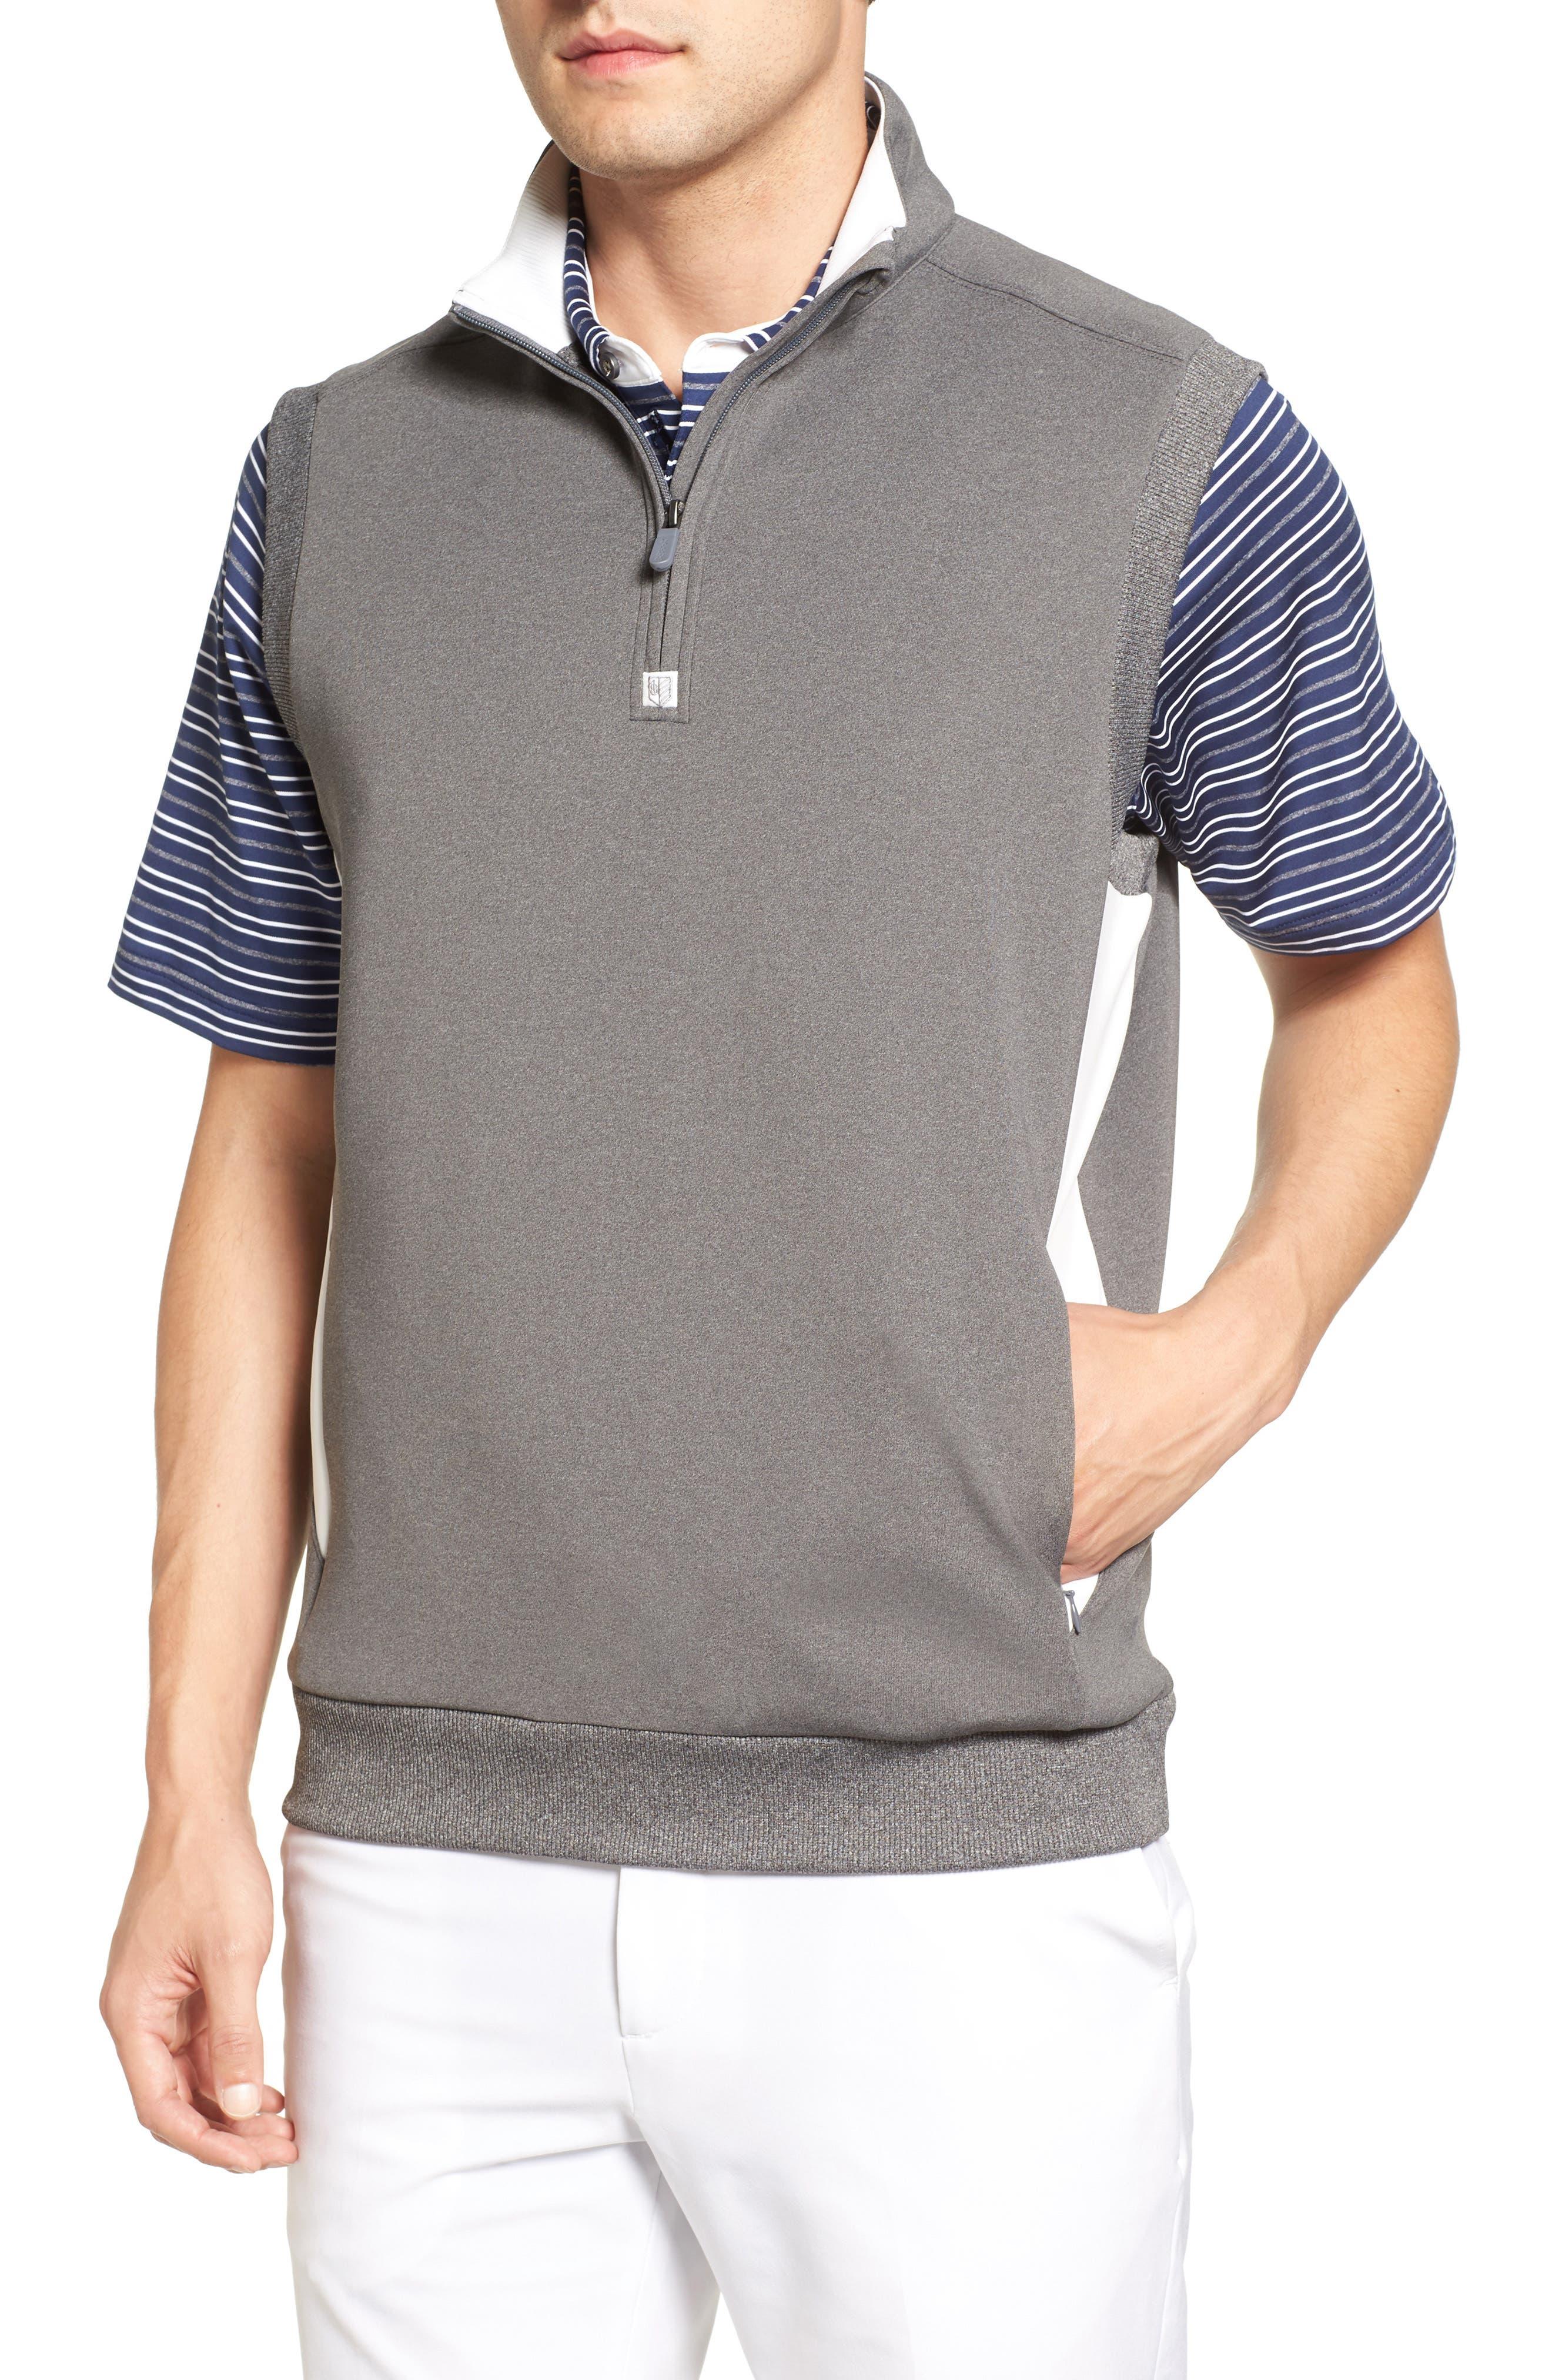 Main Image - Bobby Jones Rule 18 Tech Quarter Zip Vest